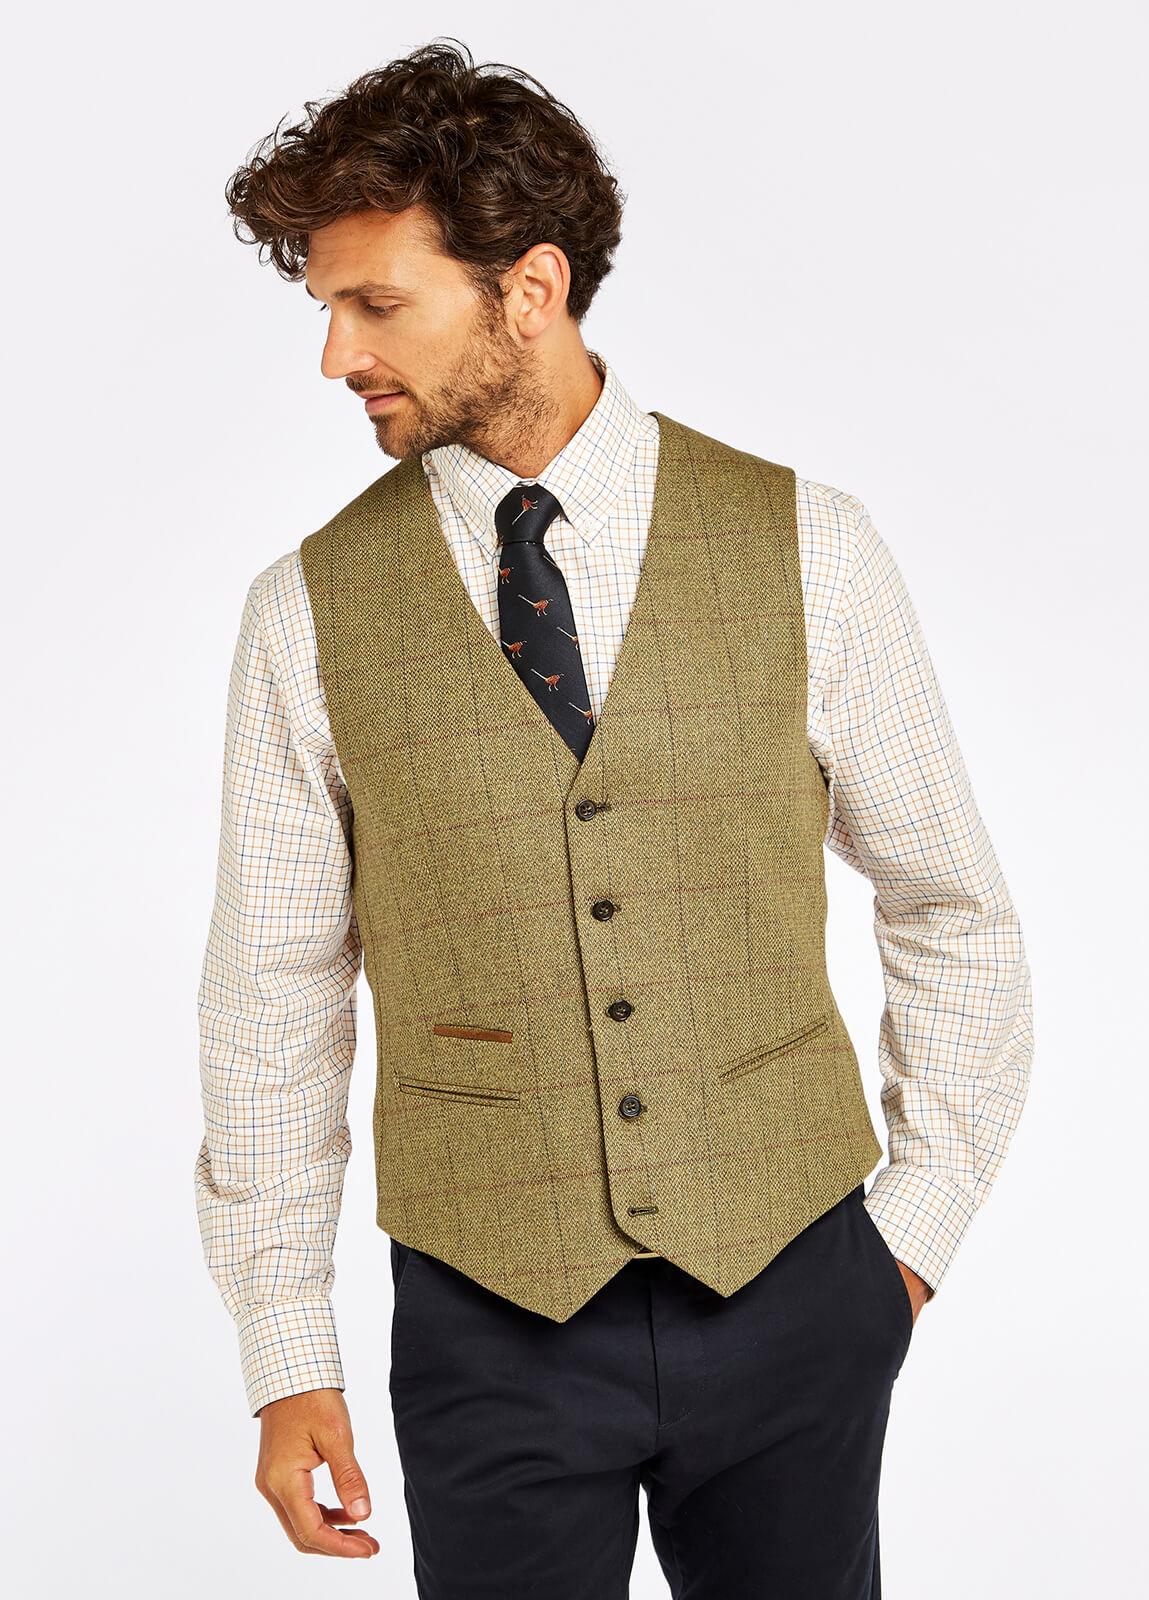 Ballyshannon Tweed Waistcoat - Beechwood